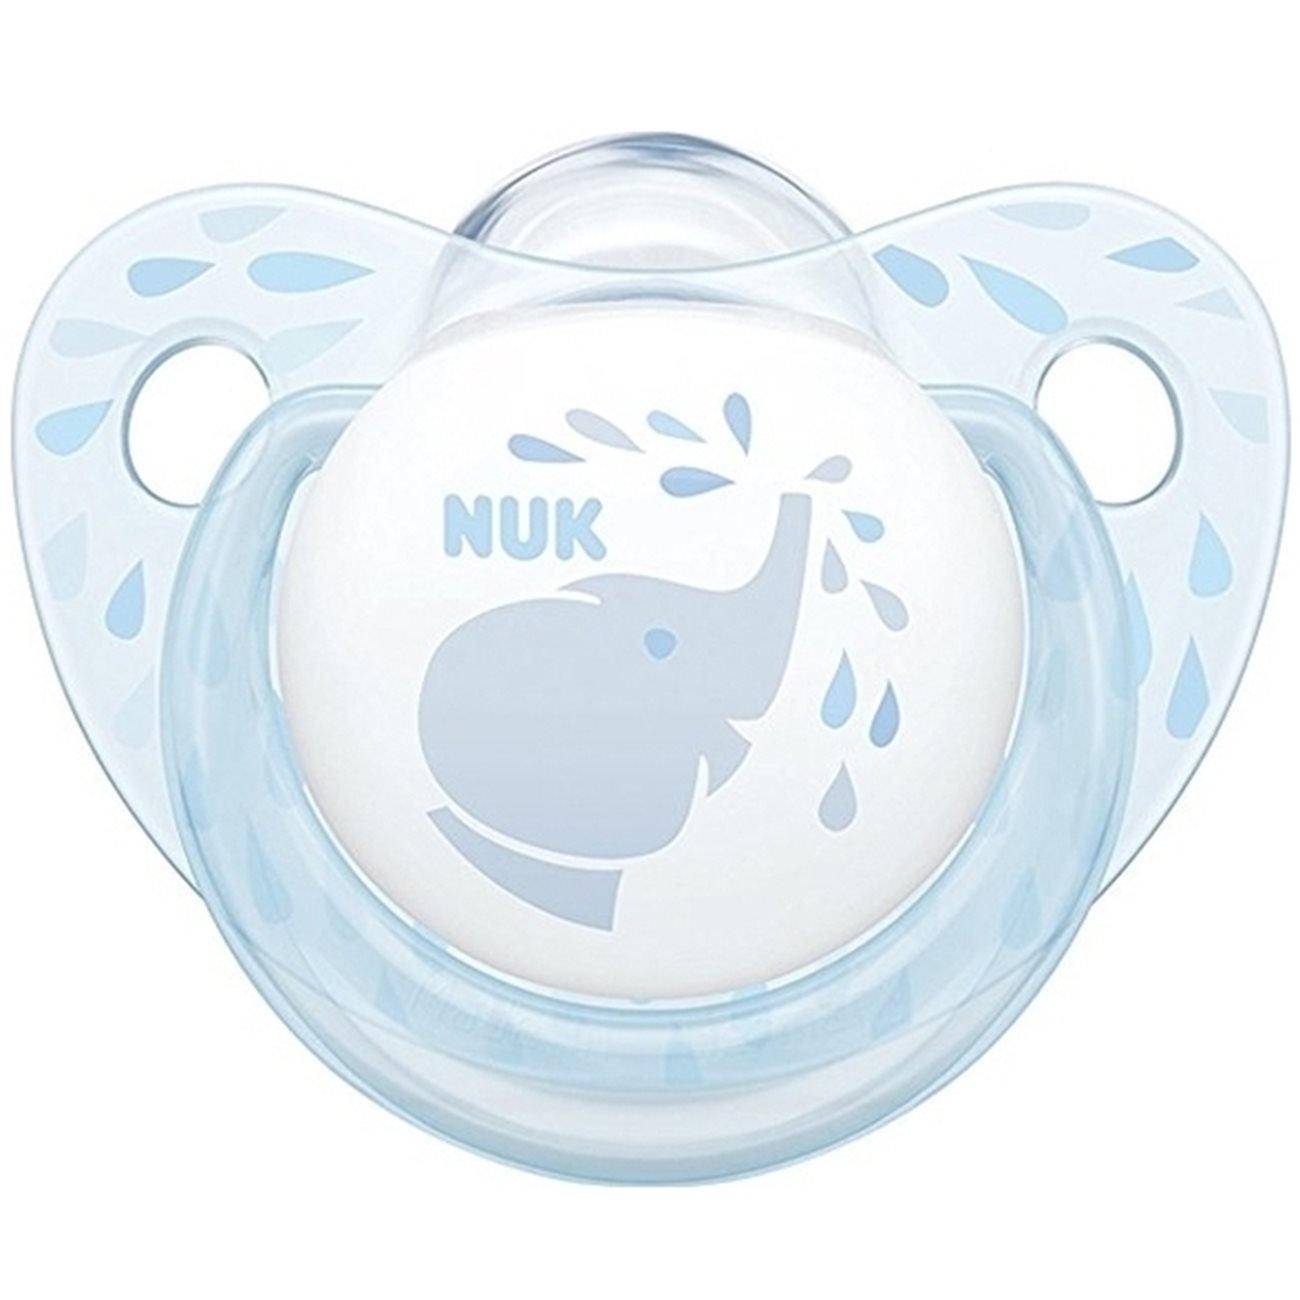 Nuk Baby Rose & Blue Πιπίλα Σιλικόνης με Κρίκο 1τεμάχιο – Baby Blue2 6-18 Μηνών